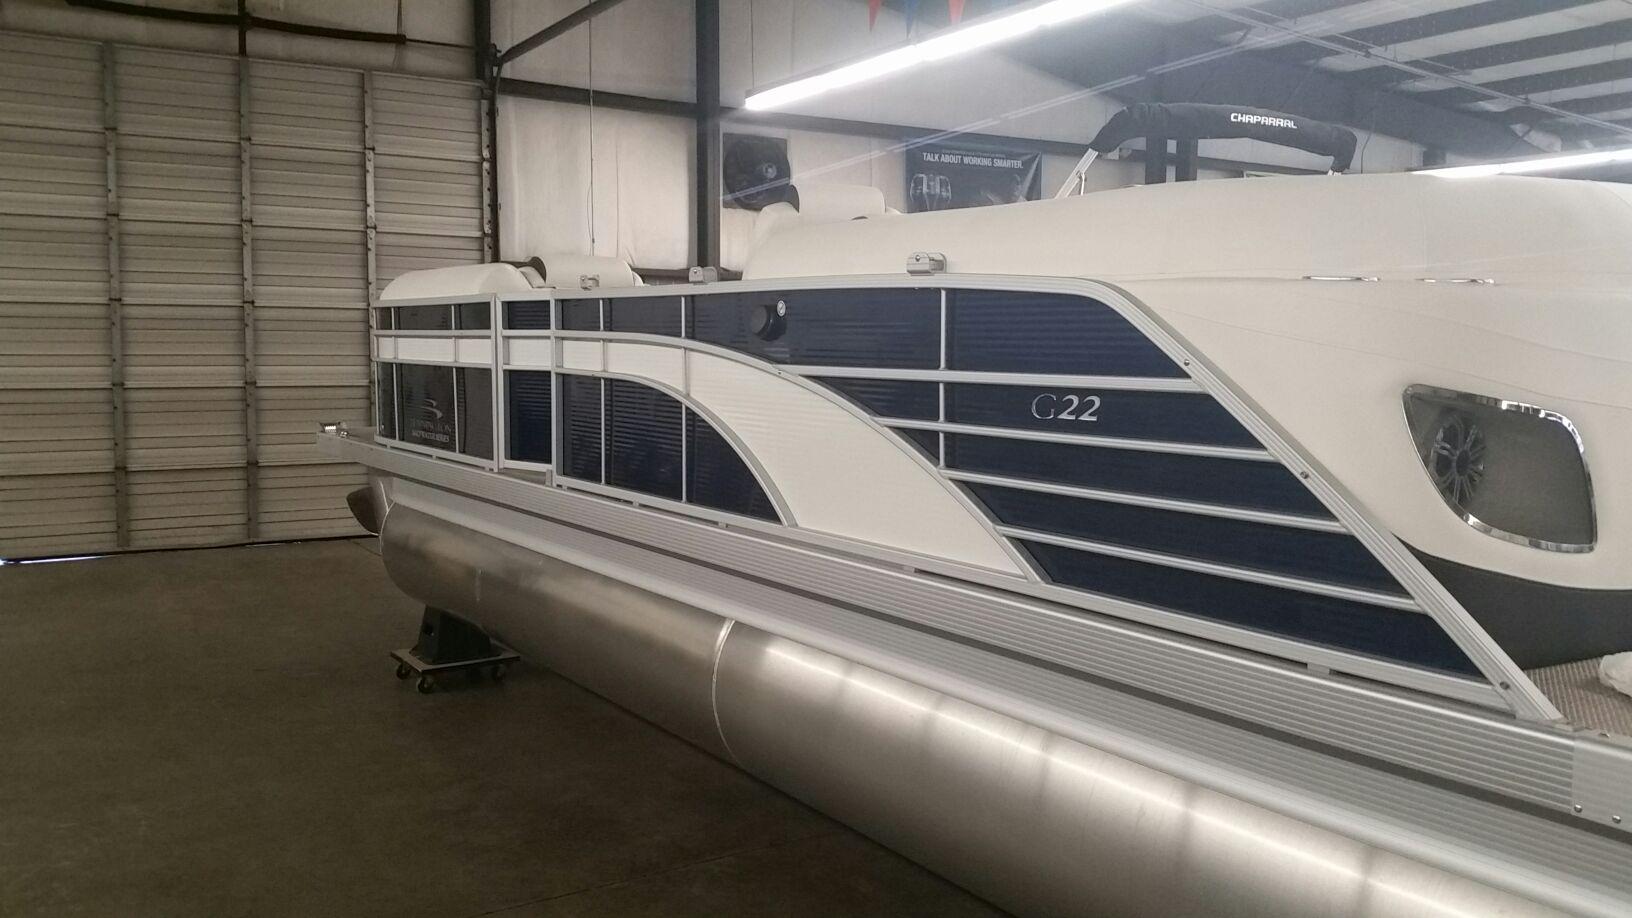 2017 bennington 22gsr fastback 24 foot 2017 bennington boat in greensboro nc 4443378782. Black Bedroom Furniture Sets. Home Design Ideas